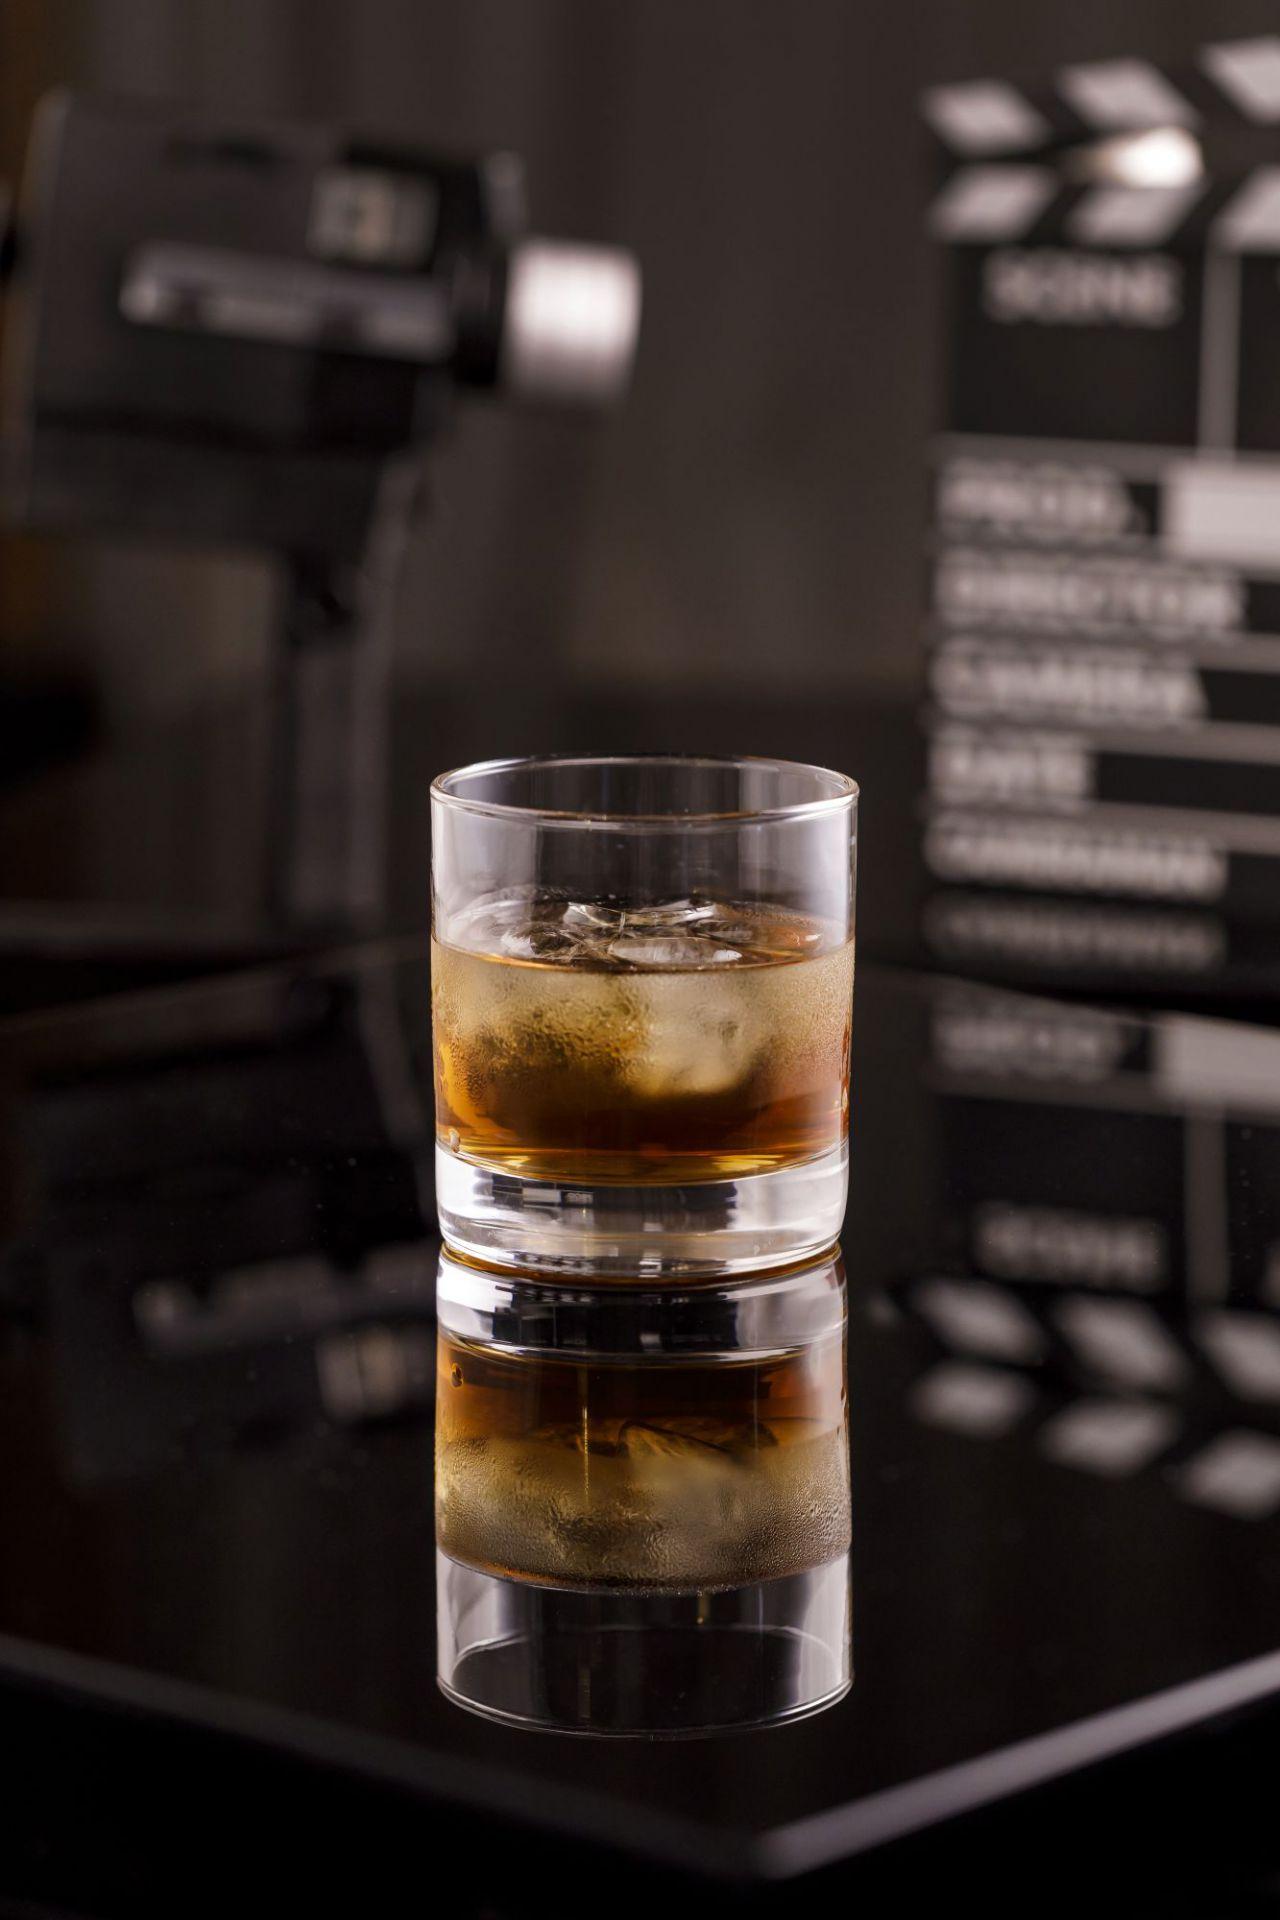 Whisky on the rocks- David Niven